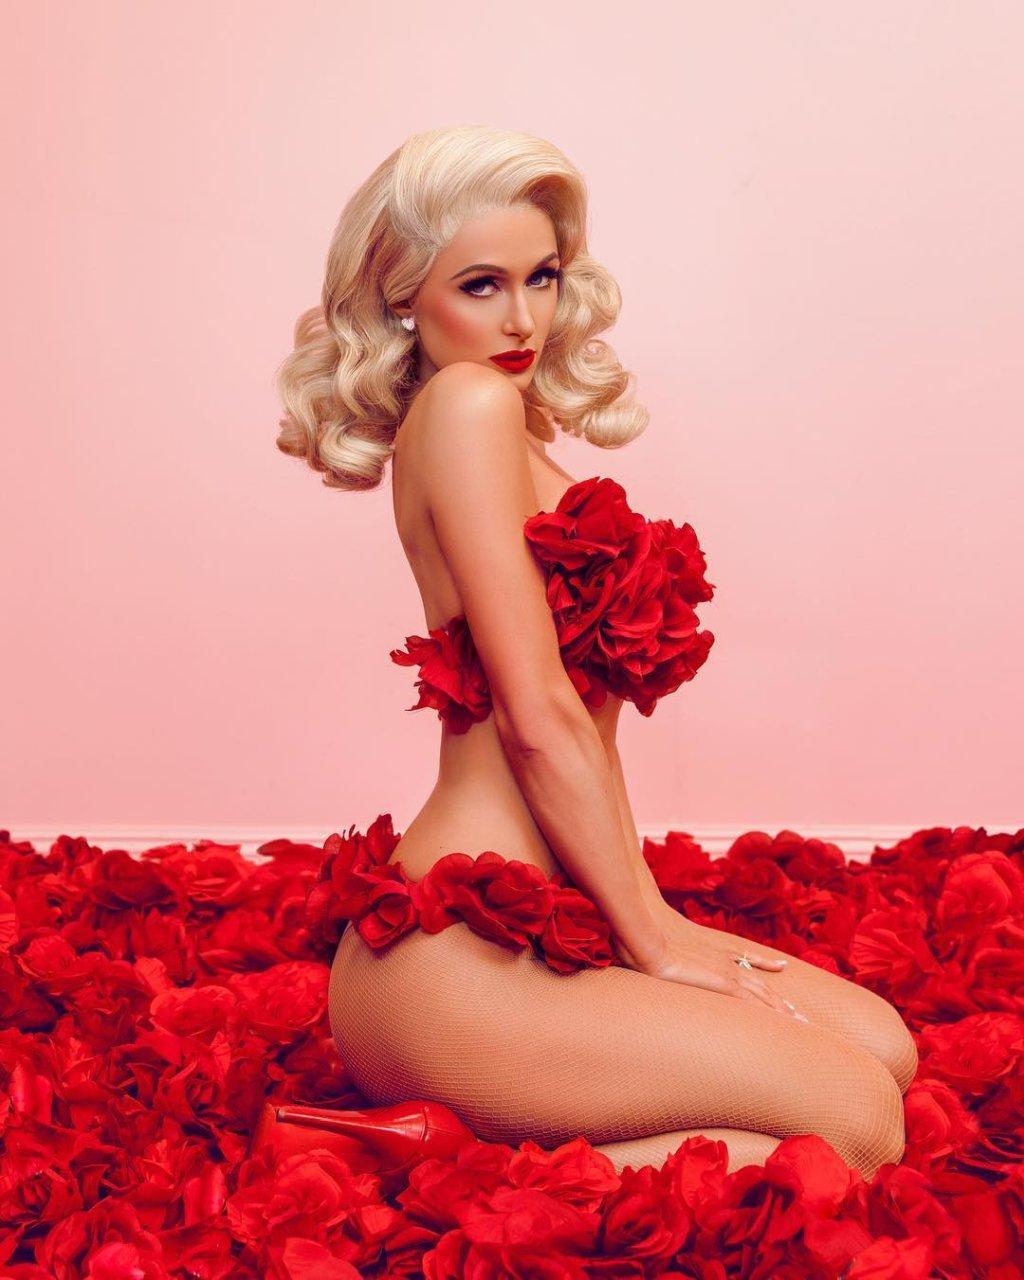 sexy nude images of paris hilton